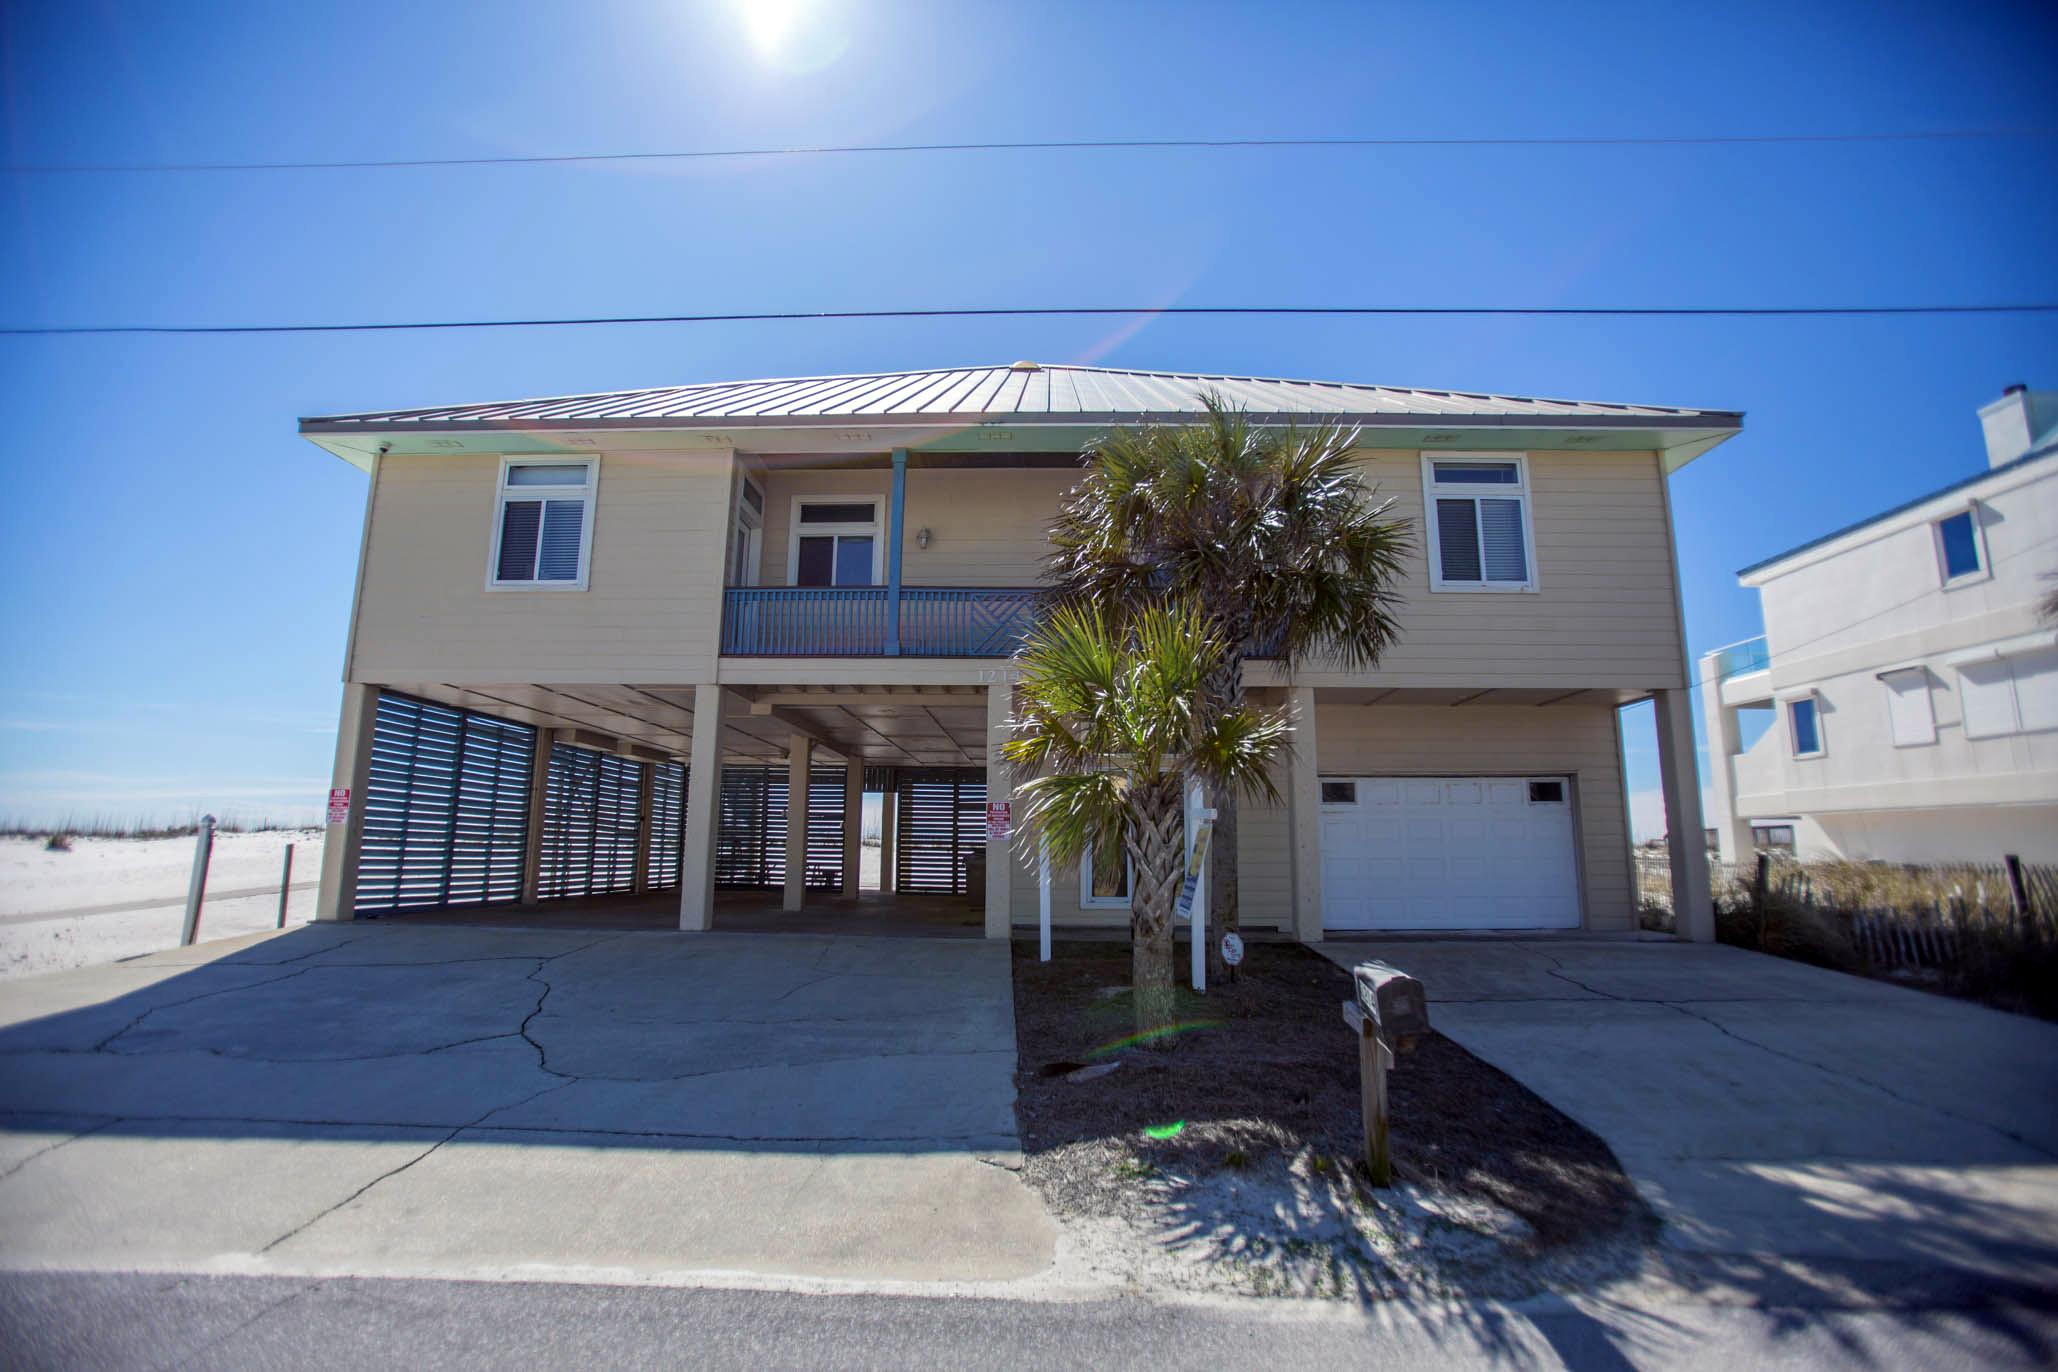 Ariola 1214 House/Cottage rental in Luxury Homes in Pensacola Beach Florida - #5